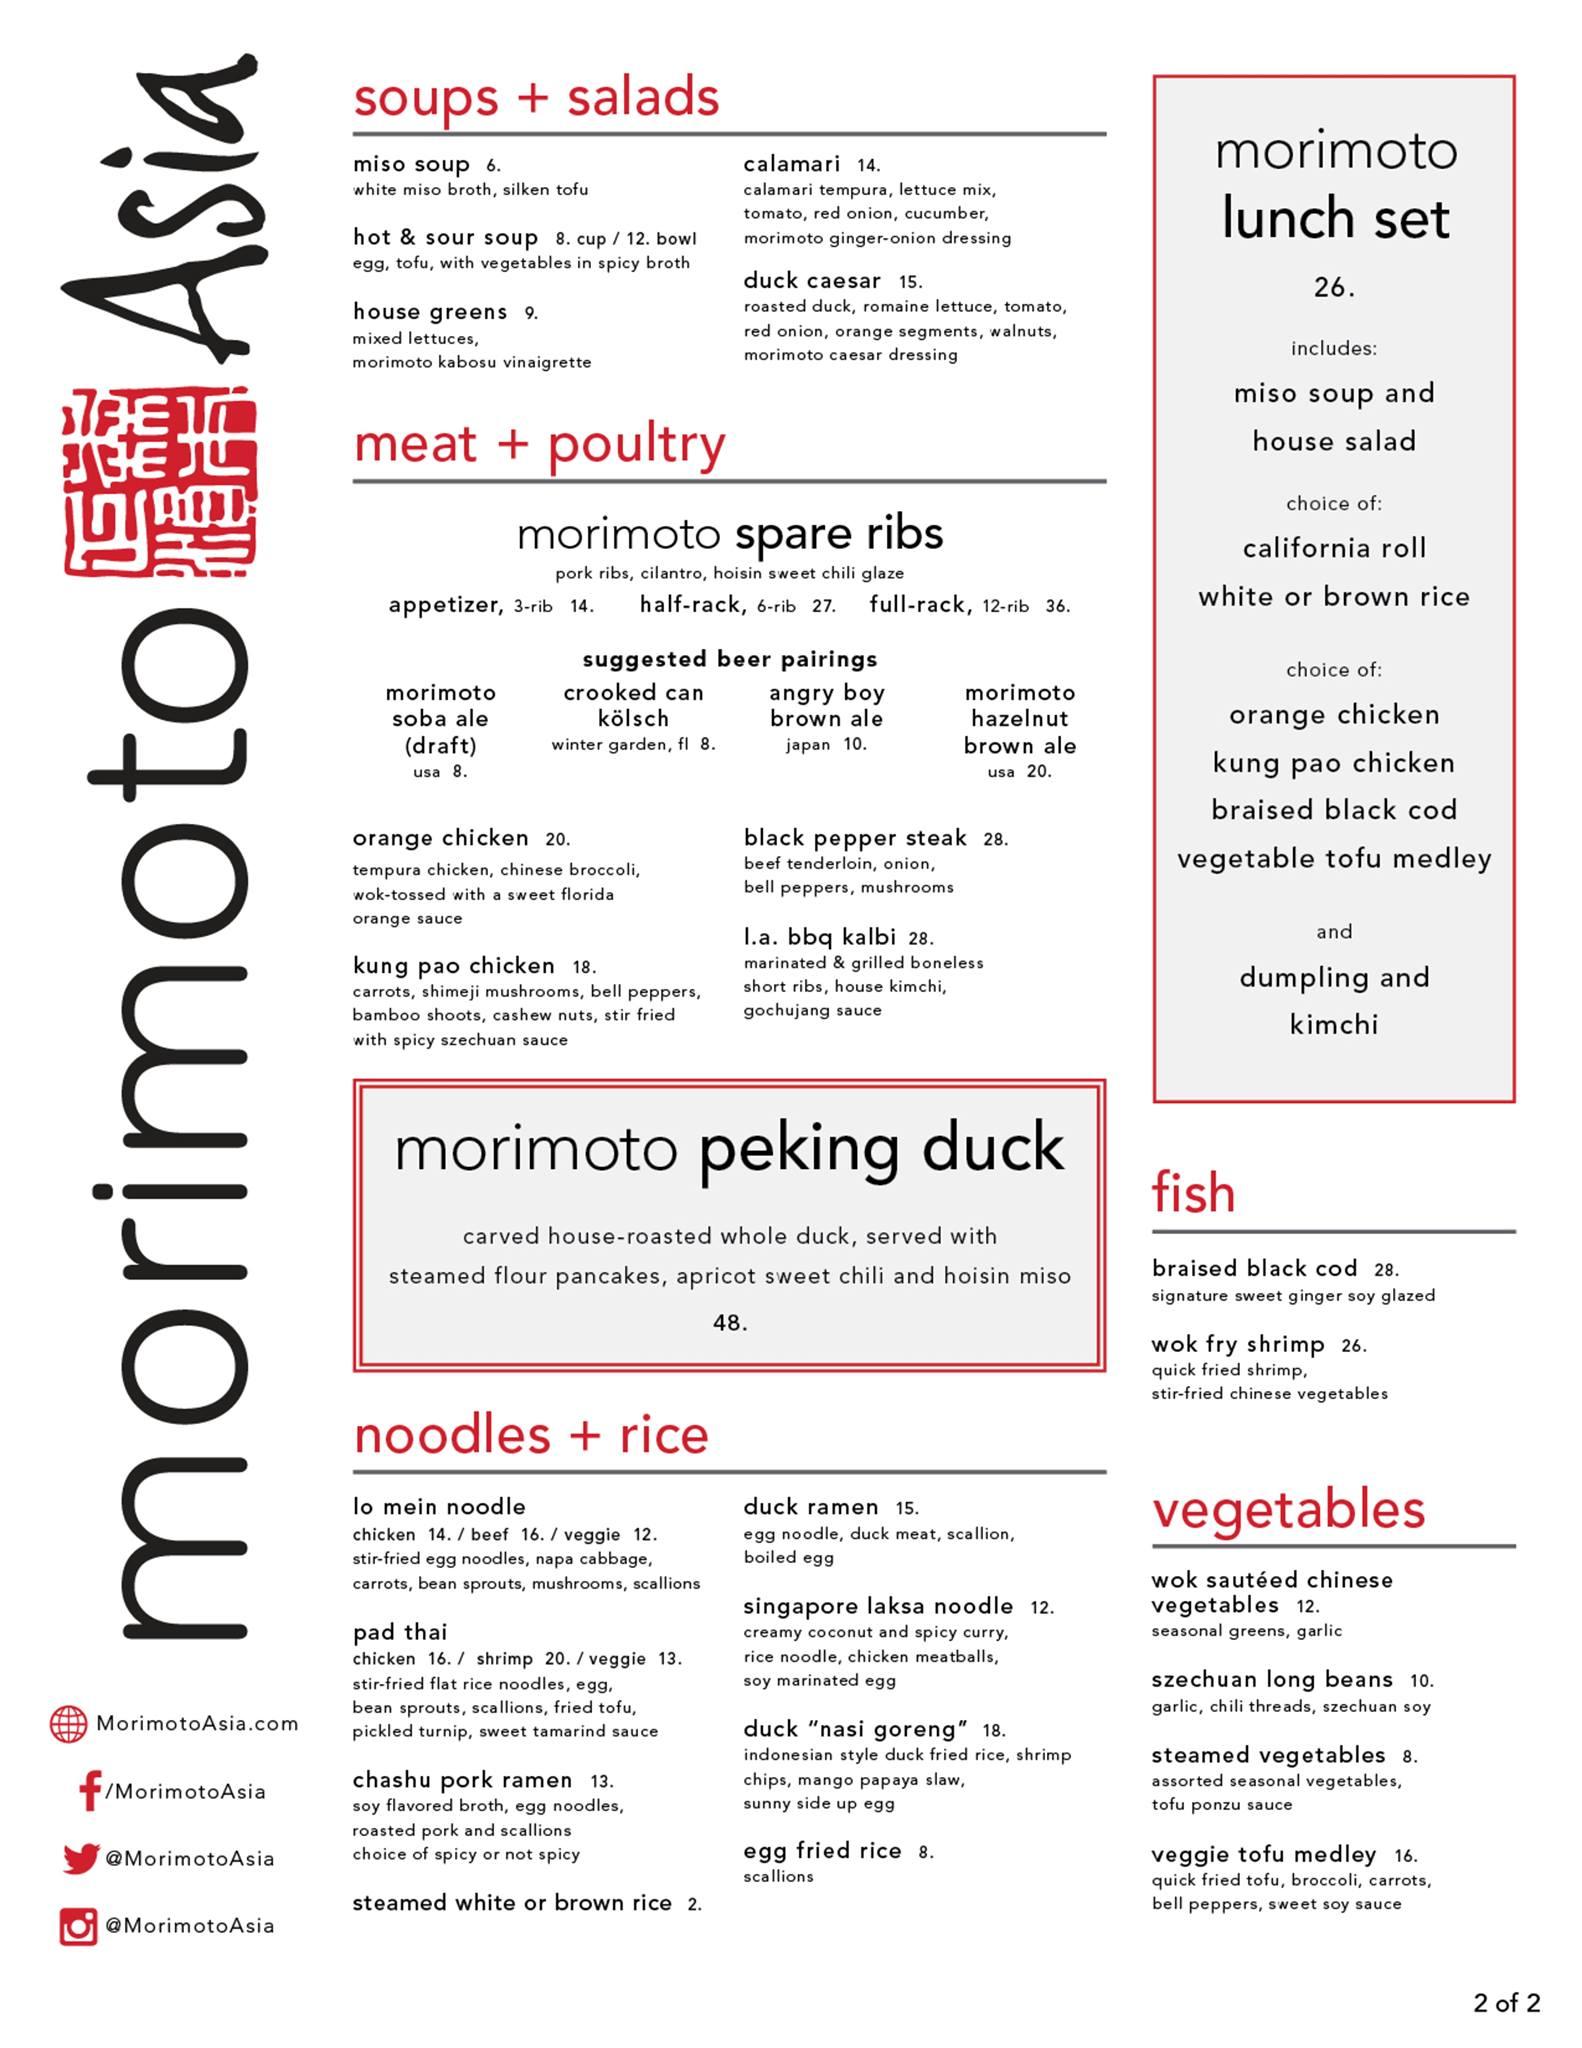 Morimoto Asia lunch menu - Page 2